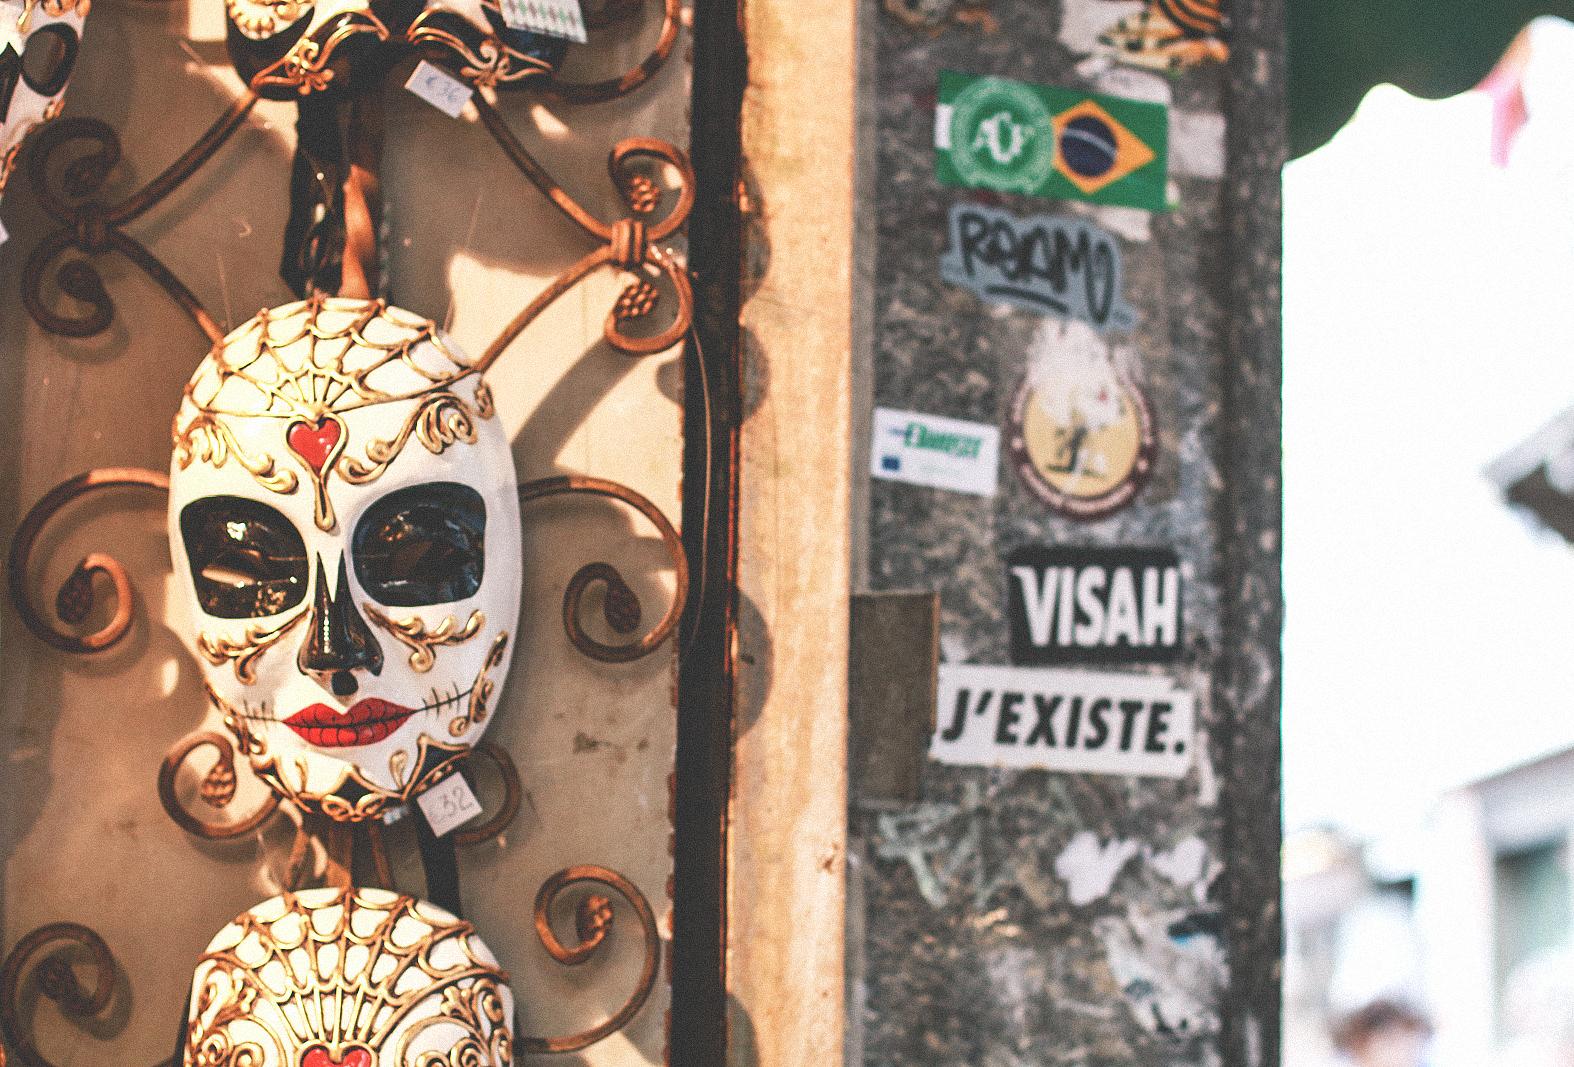 Venezia_travel_blogger_fashion_moscow_ritalifestyle_margarita_maslova_italy_trip_venice_photo